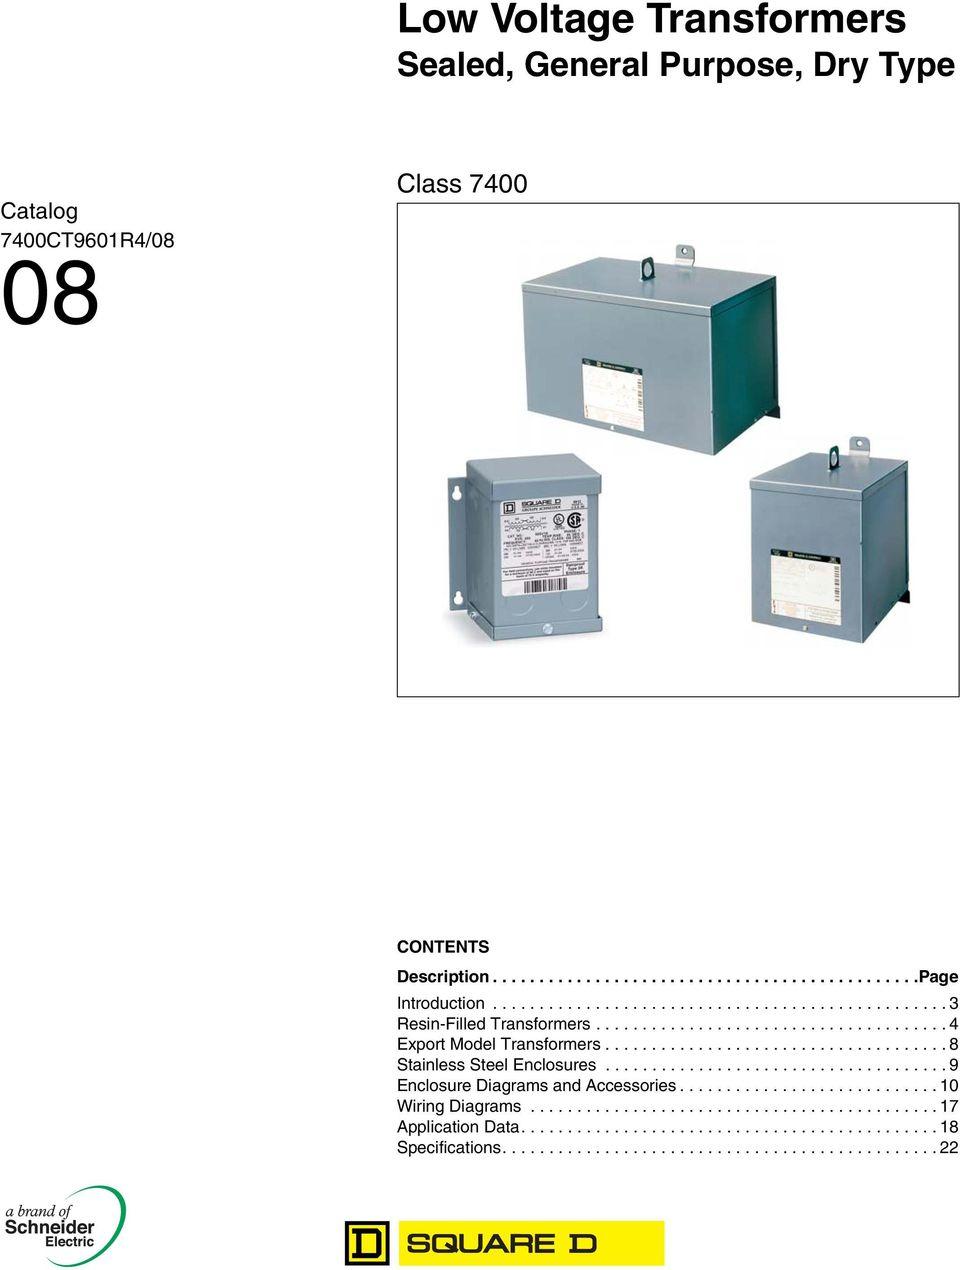 medium resolution of low voltage transformers sealed general purpose dry type pdf isolation transformer wiring diagram schneider electric transformer wiring diagram